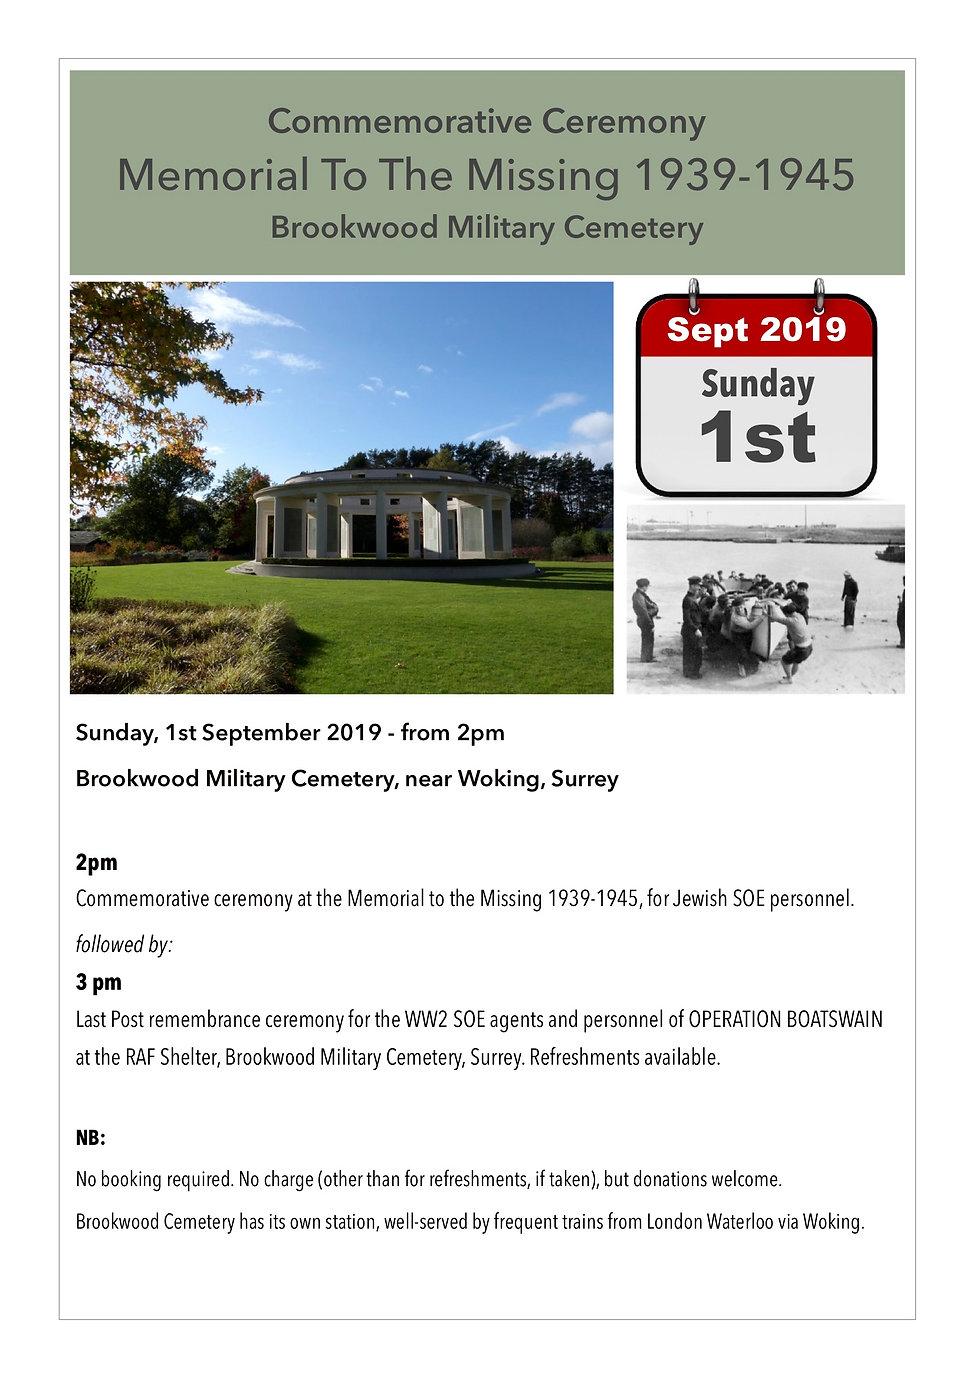 Brookwood-ceremony-Sept2019.jpg